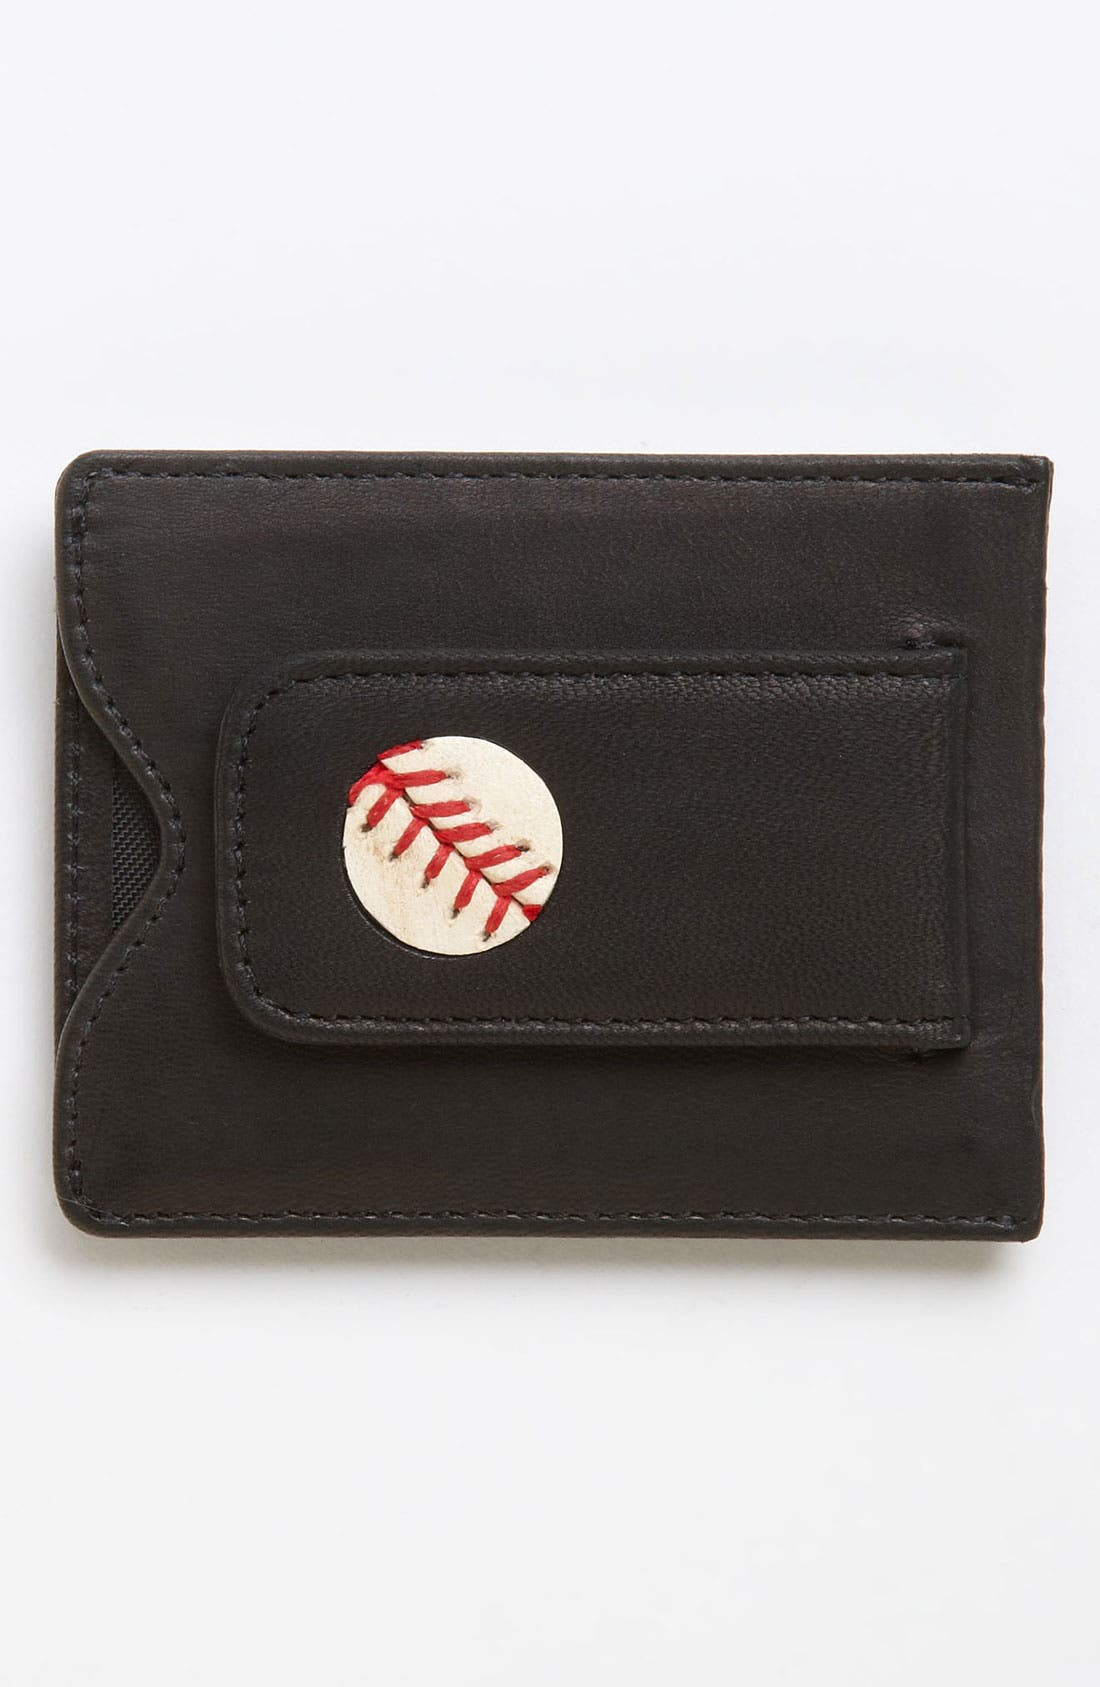 Alternate Image 1 Selected - Tokens & Icons 'Kansas City Royals' MLB™ Game-Played-Baseball Card Case